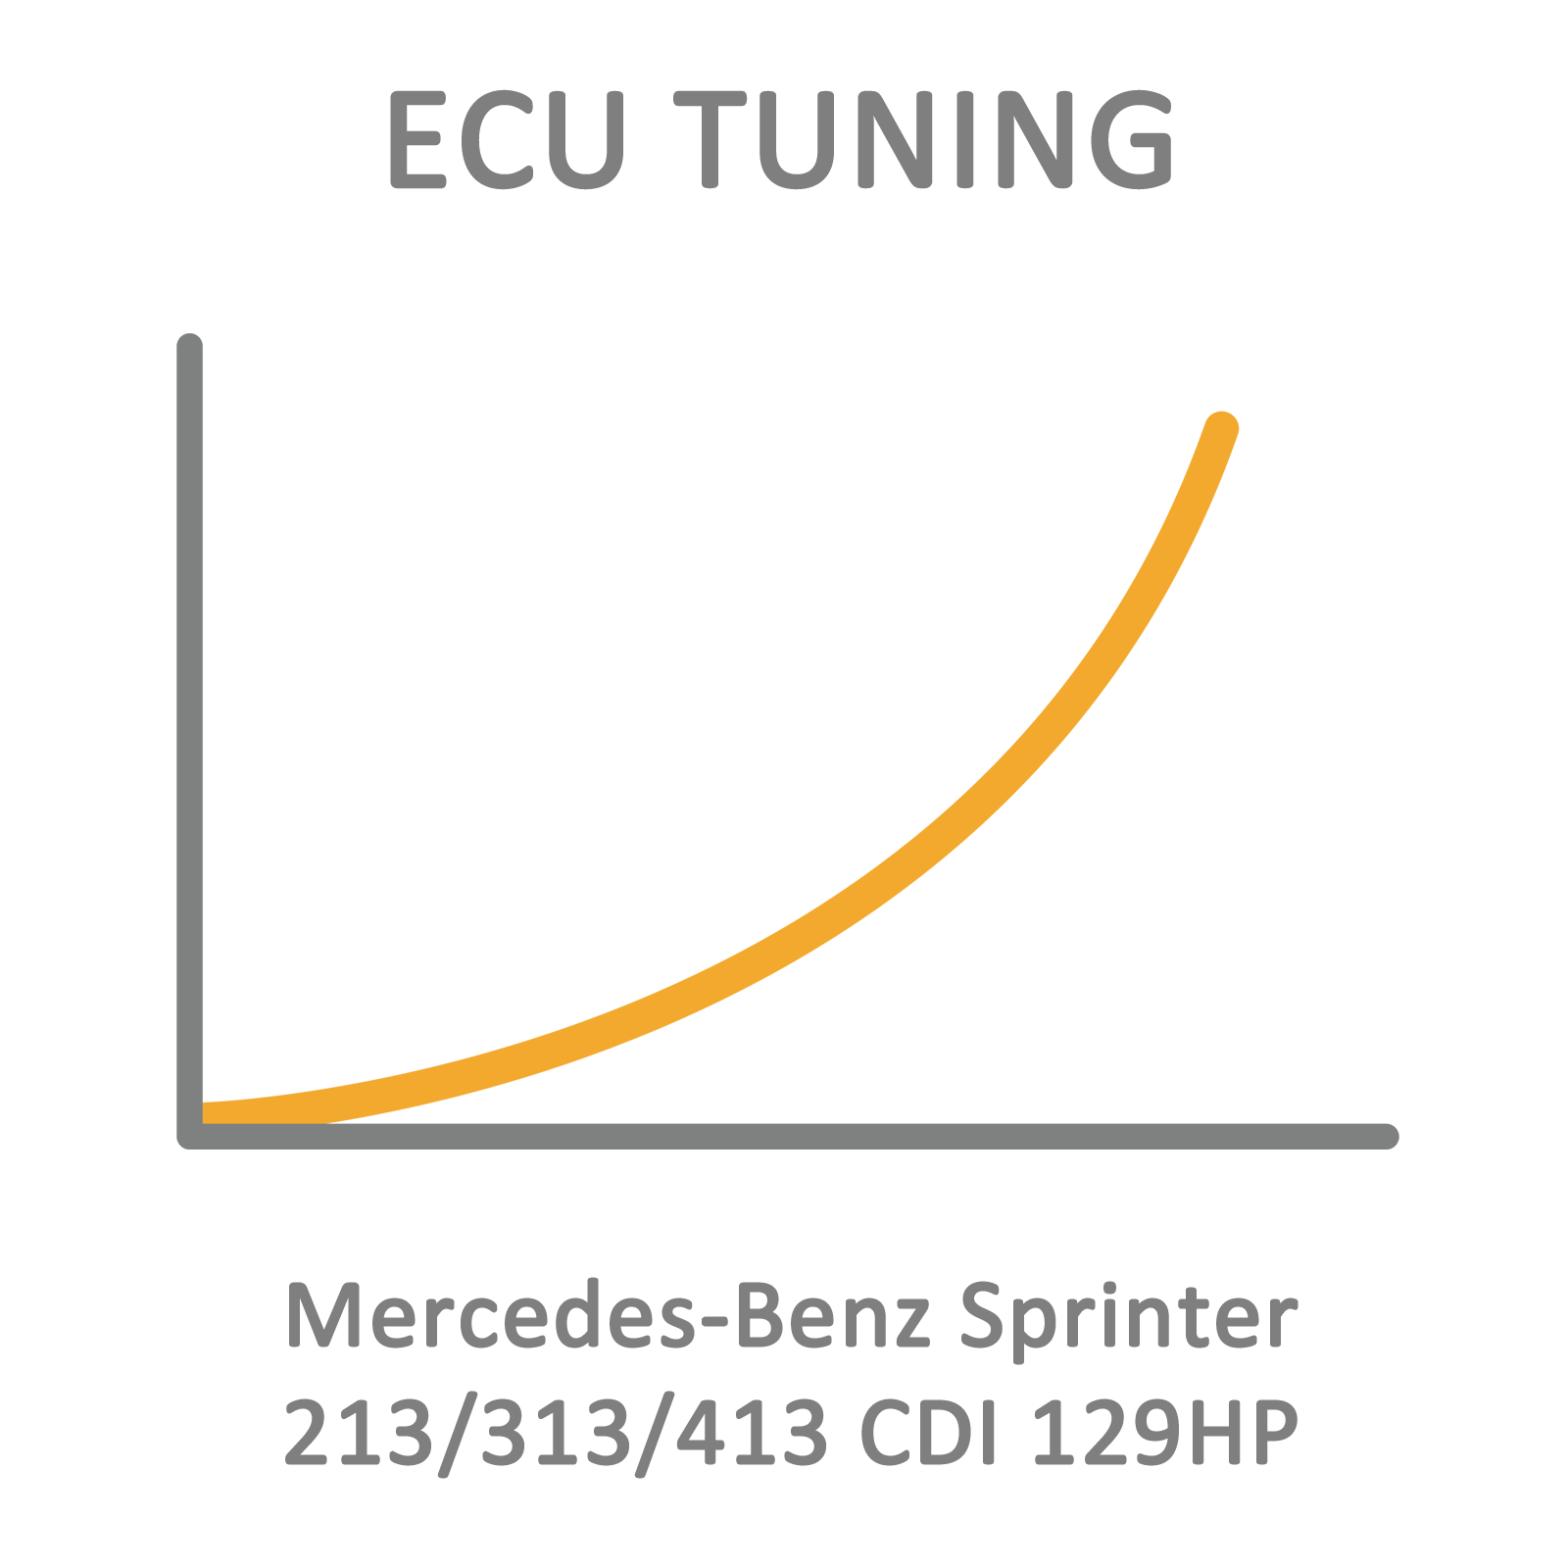 Mercedes-Benz Sprinter 213/313/413 CDI 129HP ECU Tuning